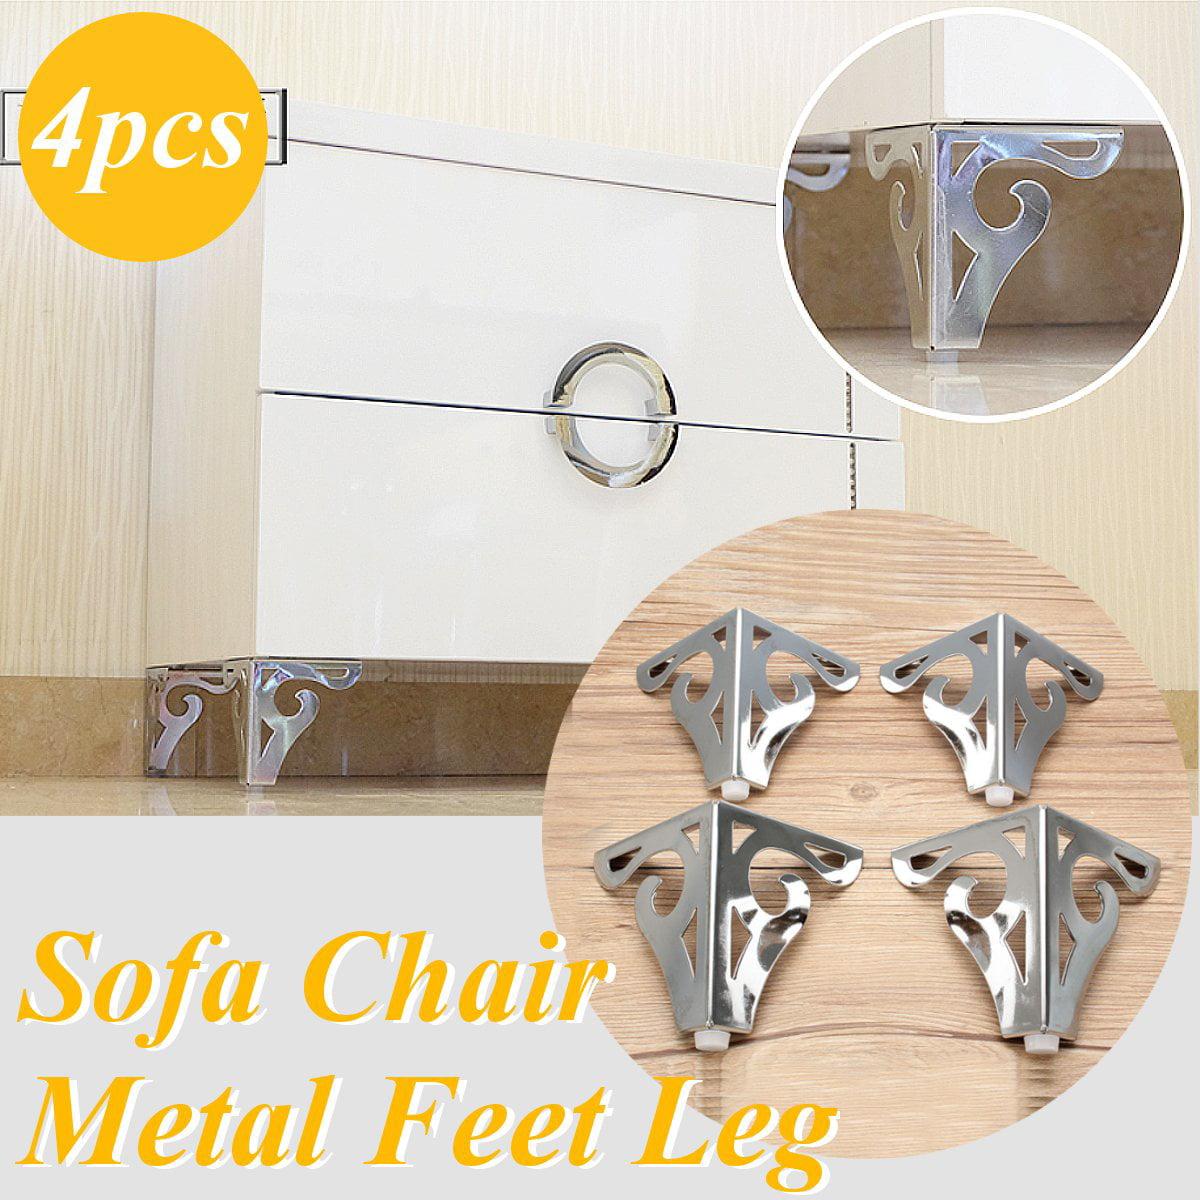 4pcs Cool Pattern Furniture Sofa Chair Metal Feet Legs Restaurant